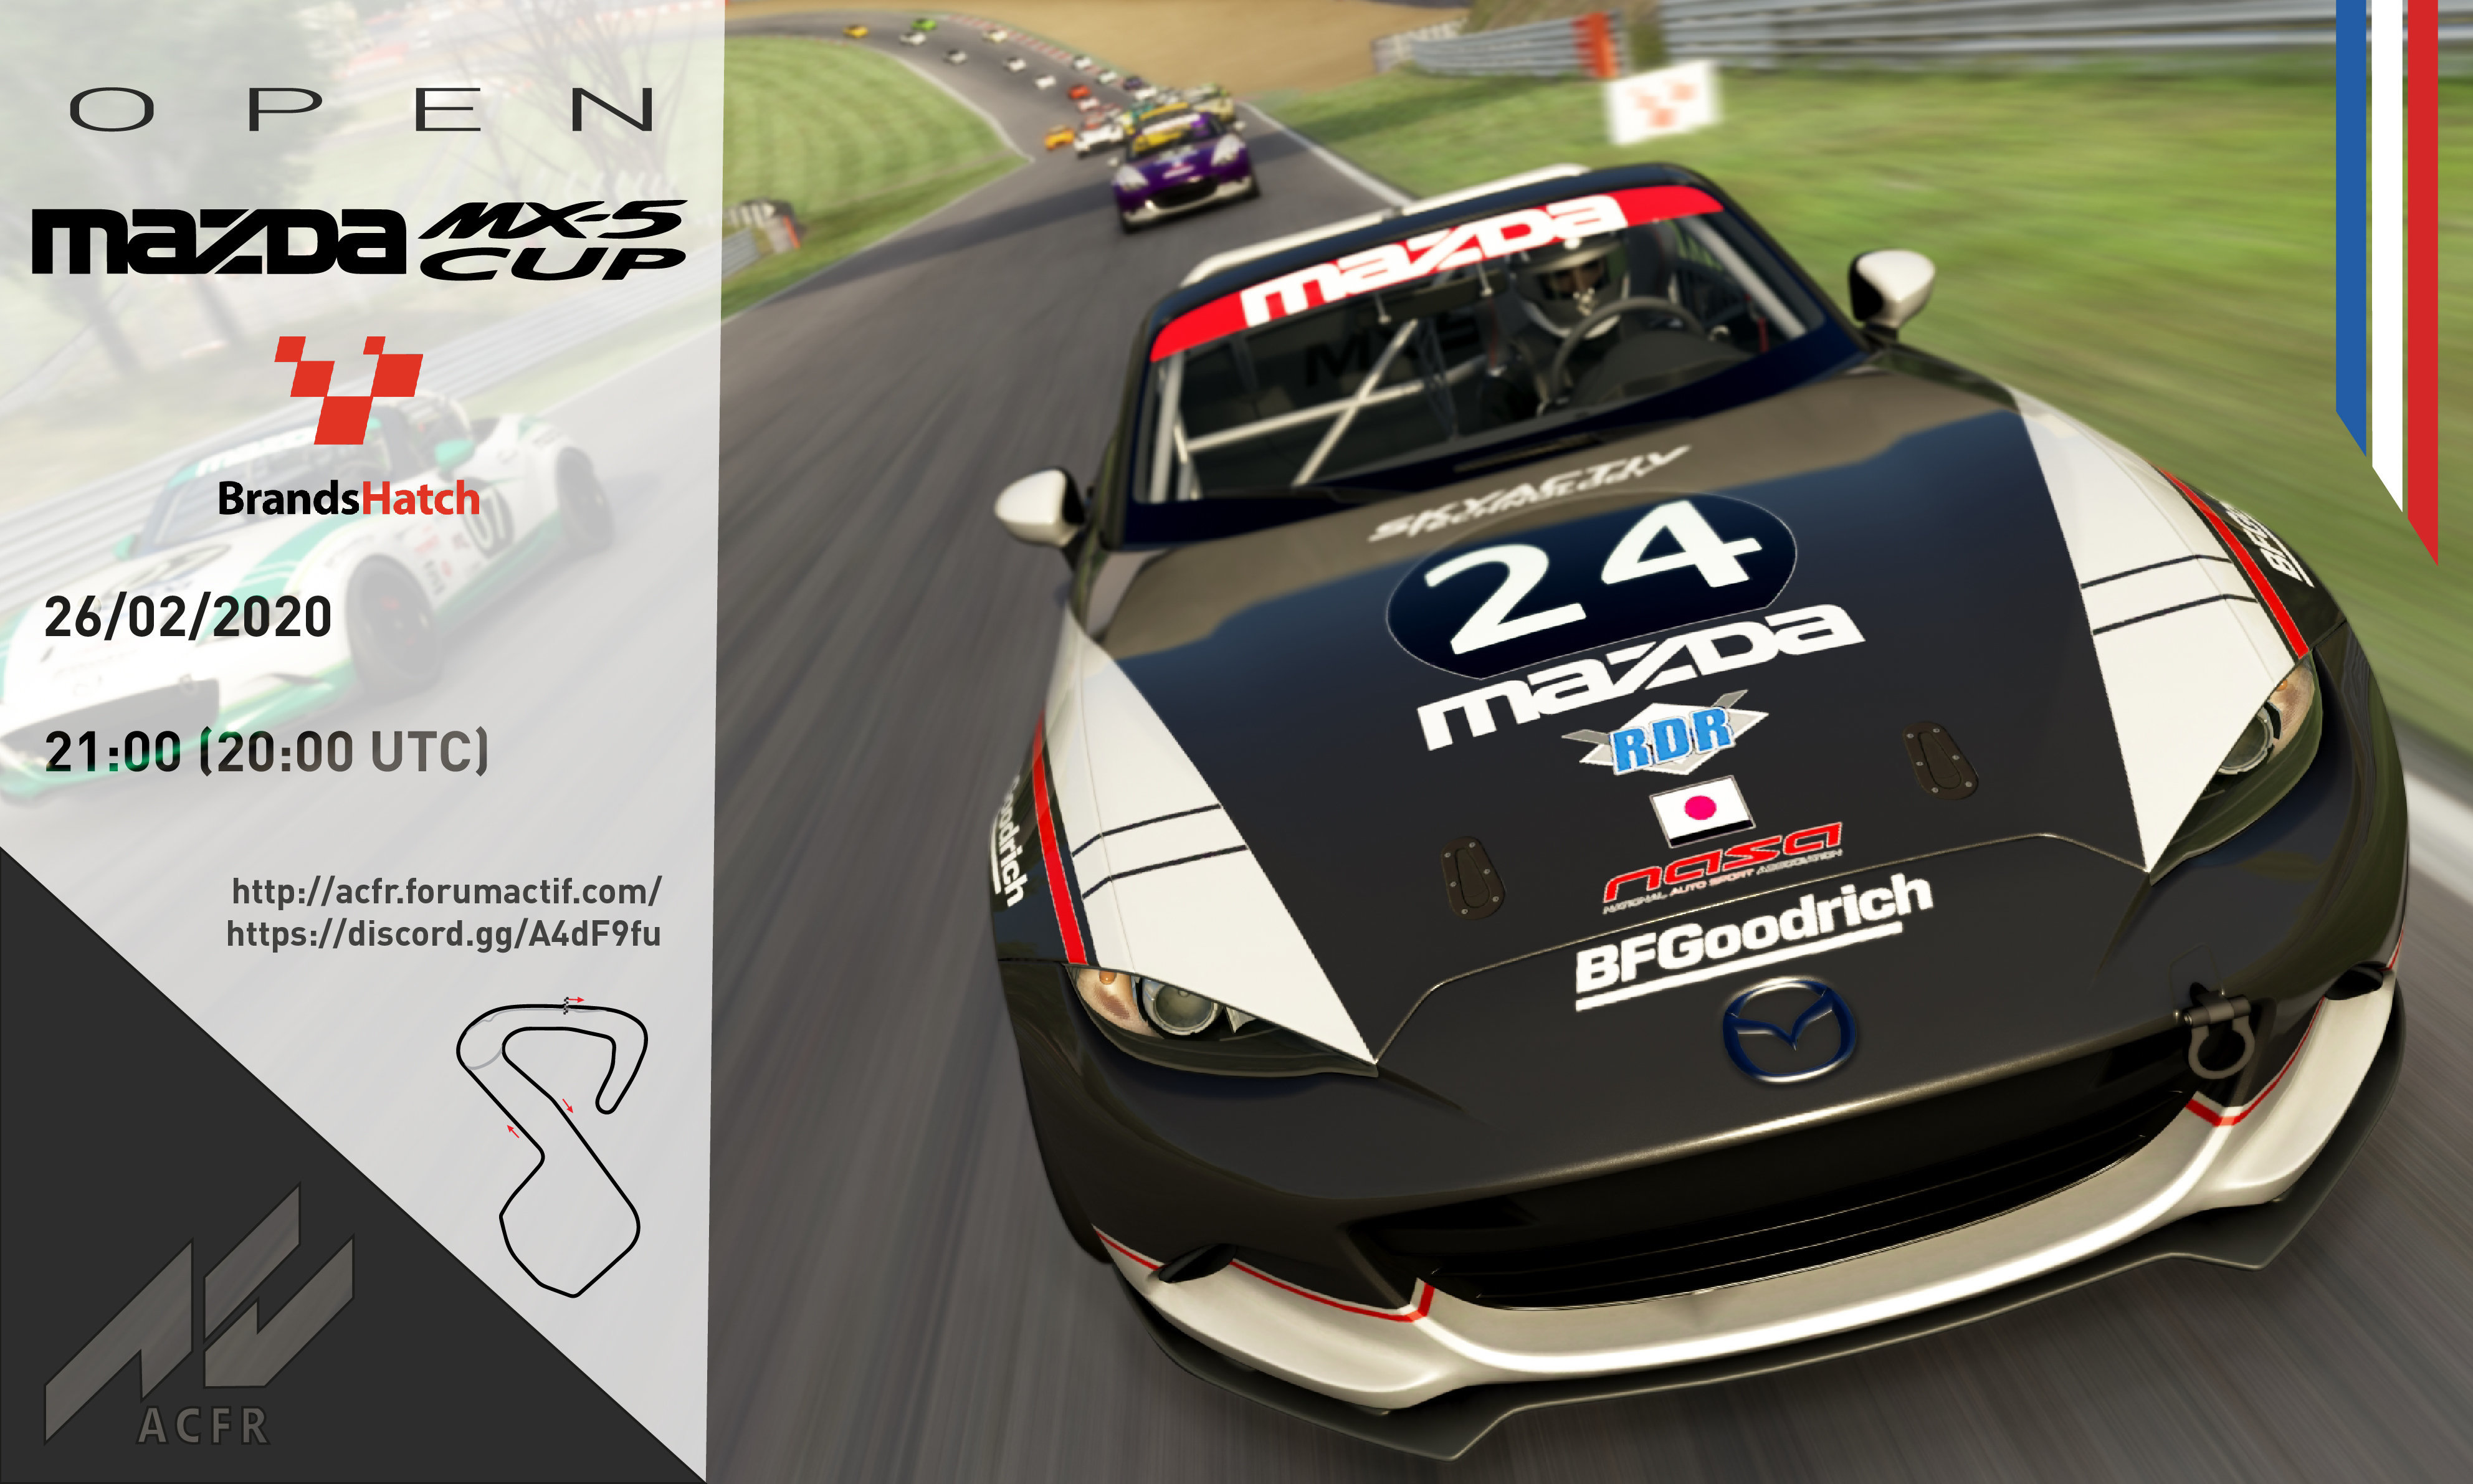 Open 26/02/2020 - Mazda MX-5 Cup | Brands Hatch - GP 1581963440-vrum-4x-100